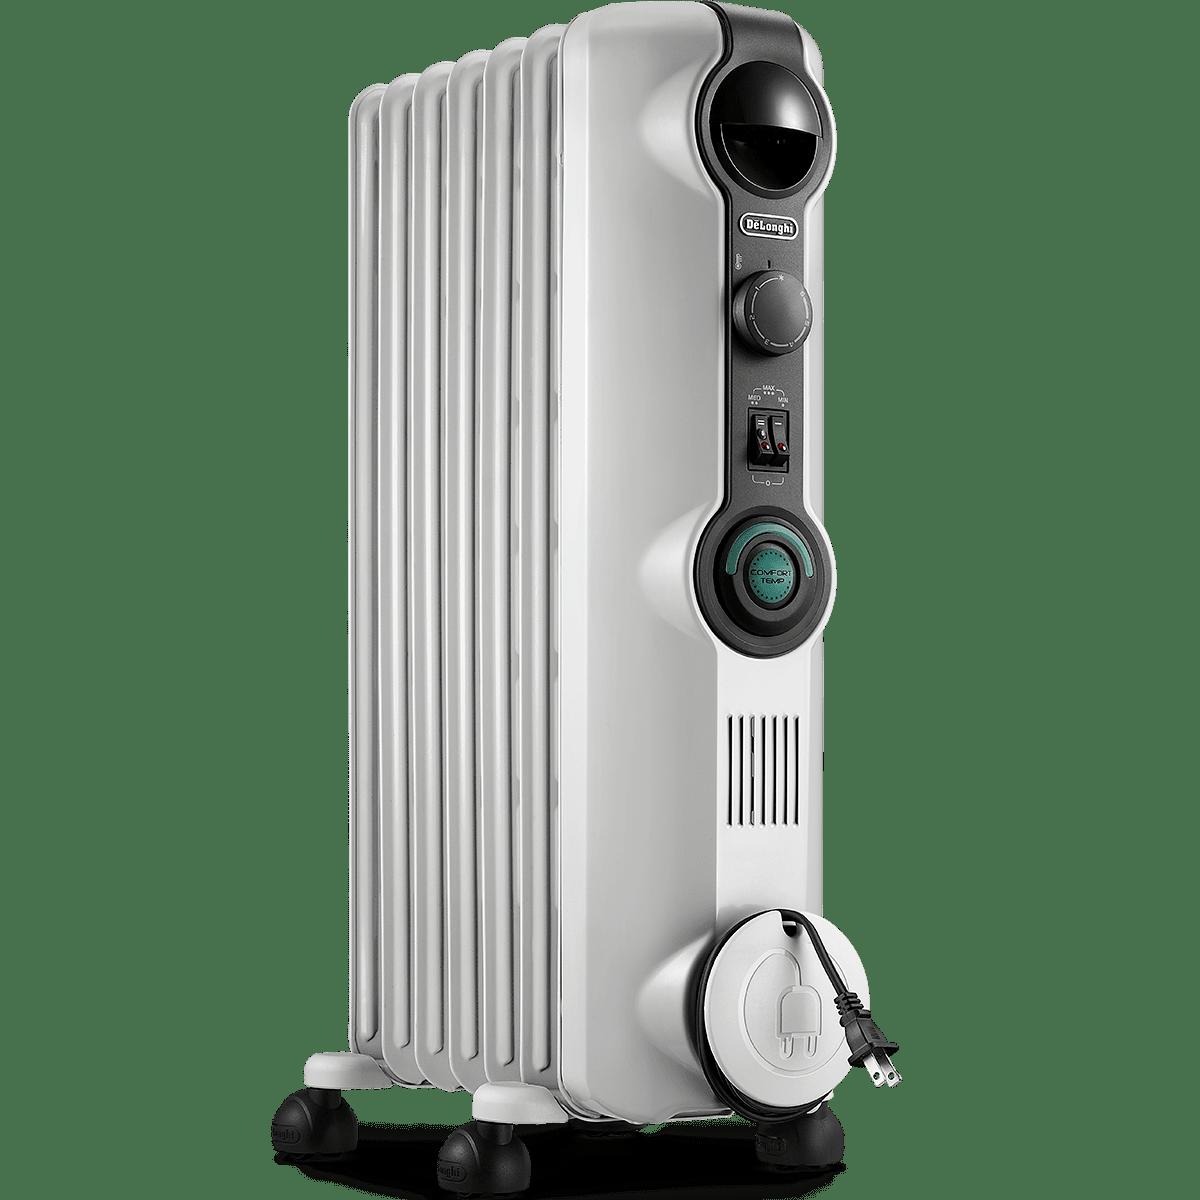 DeLonghi Comfort Temp Full Room Radiant Heater (KH390715CM) de7014